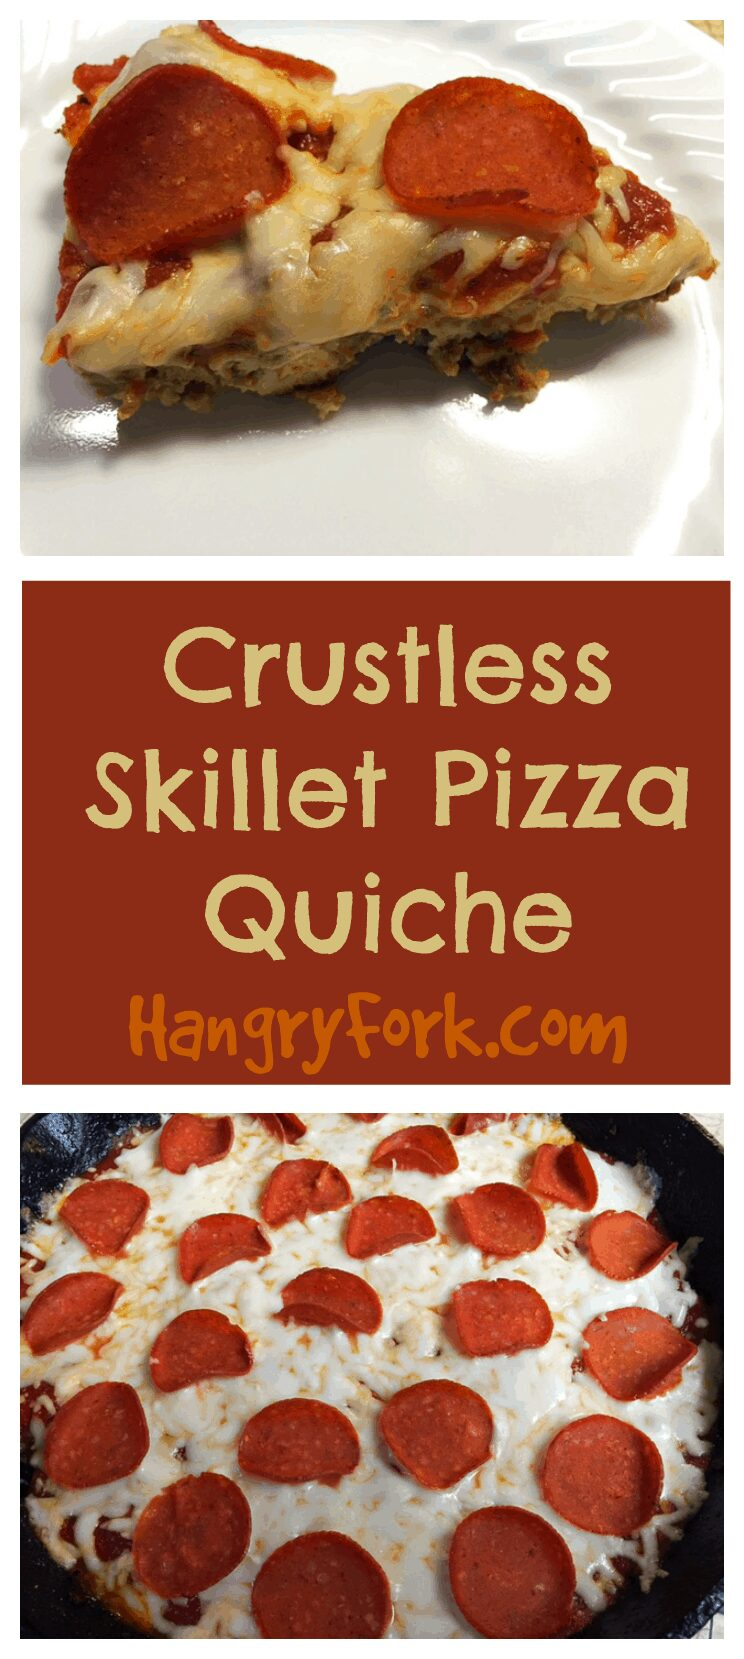 Crustless Skillet Pizza Quiche